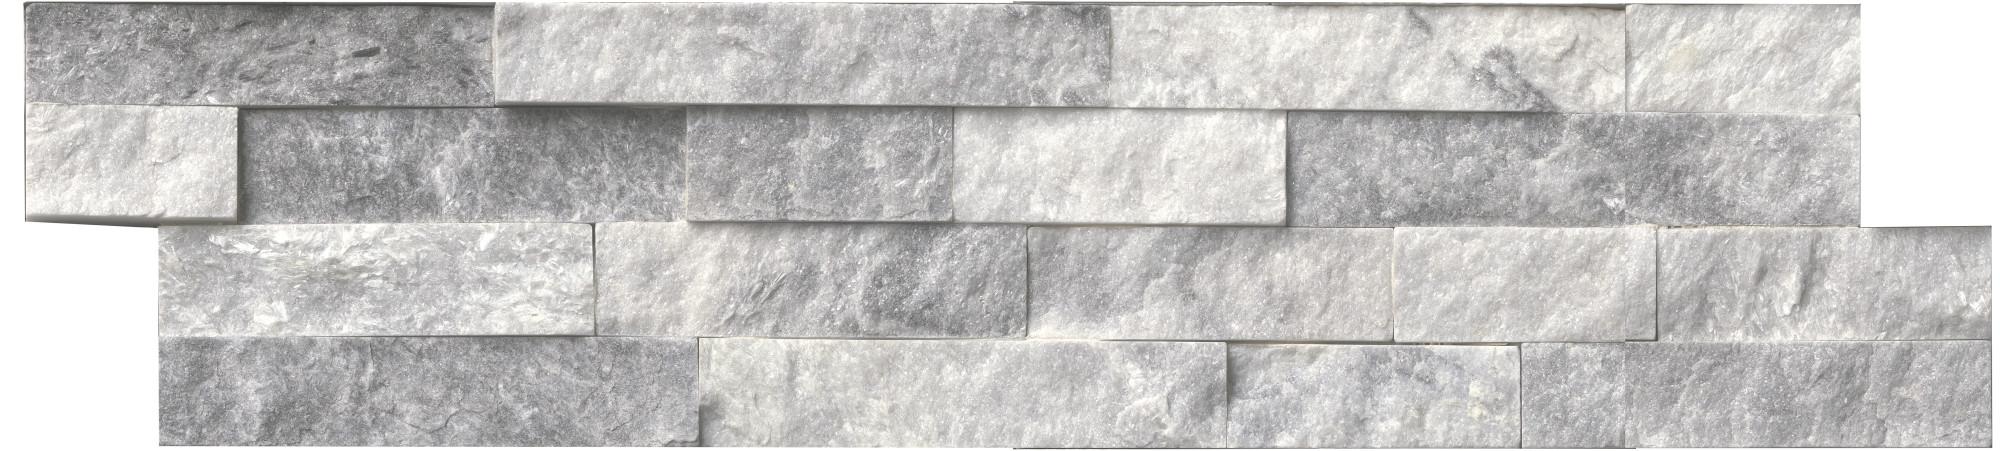 "Splitface Gold MSI LPNLSCALGLD624 24/"" x 6/"" Rectangle Wall Tile"